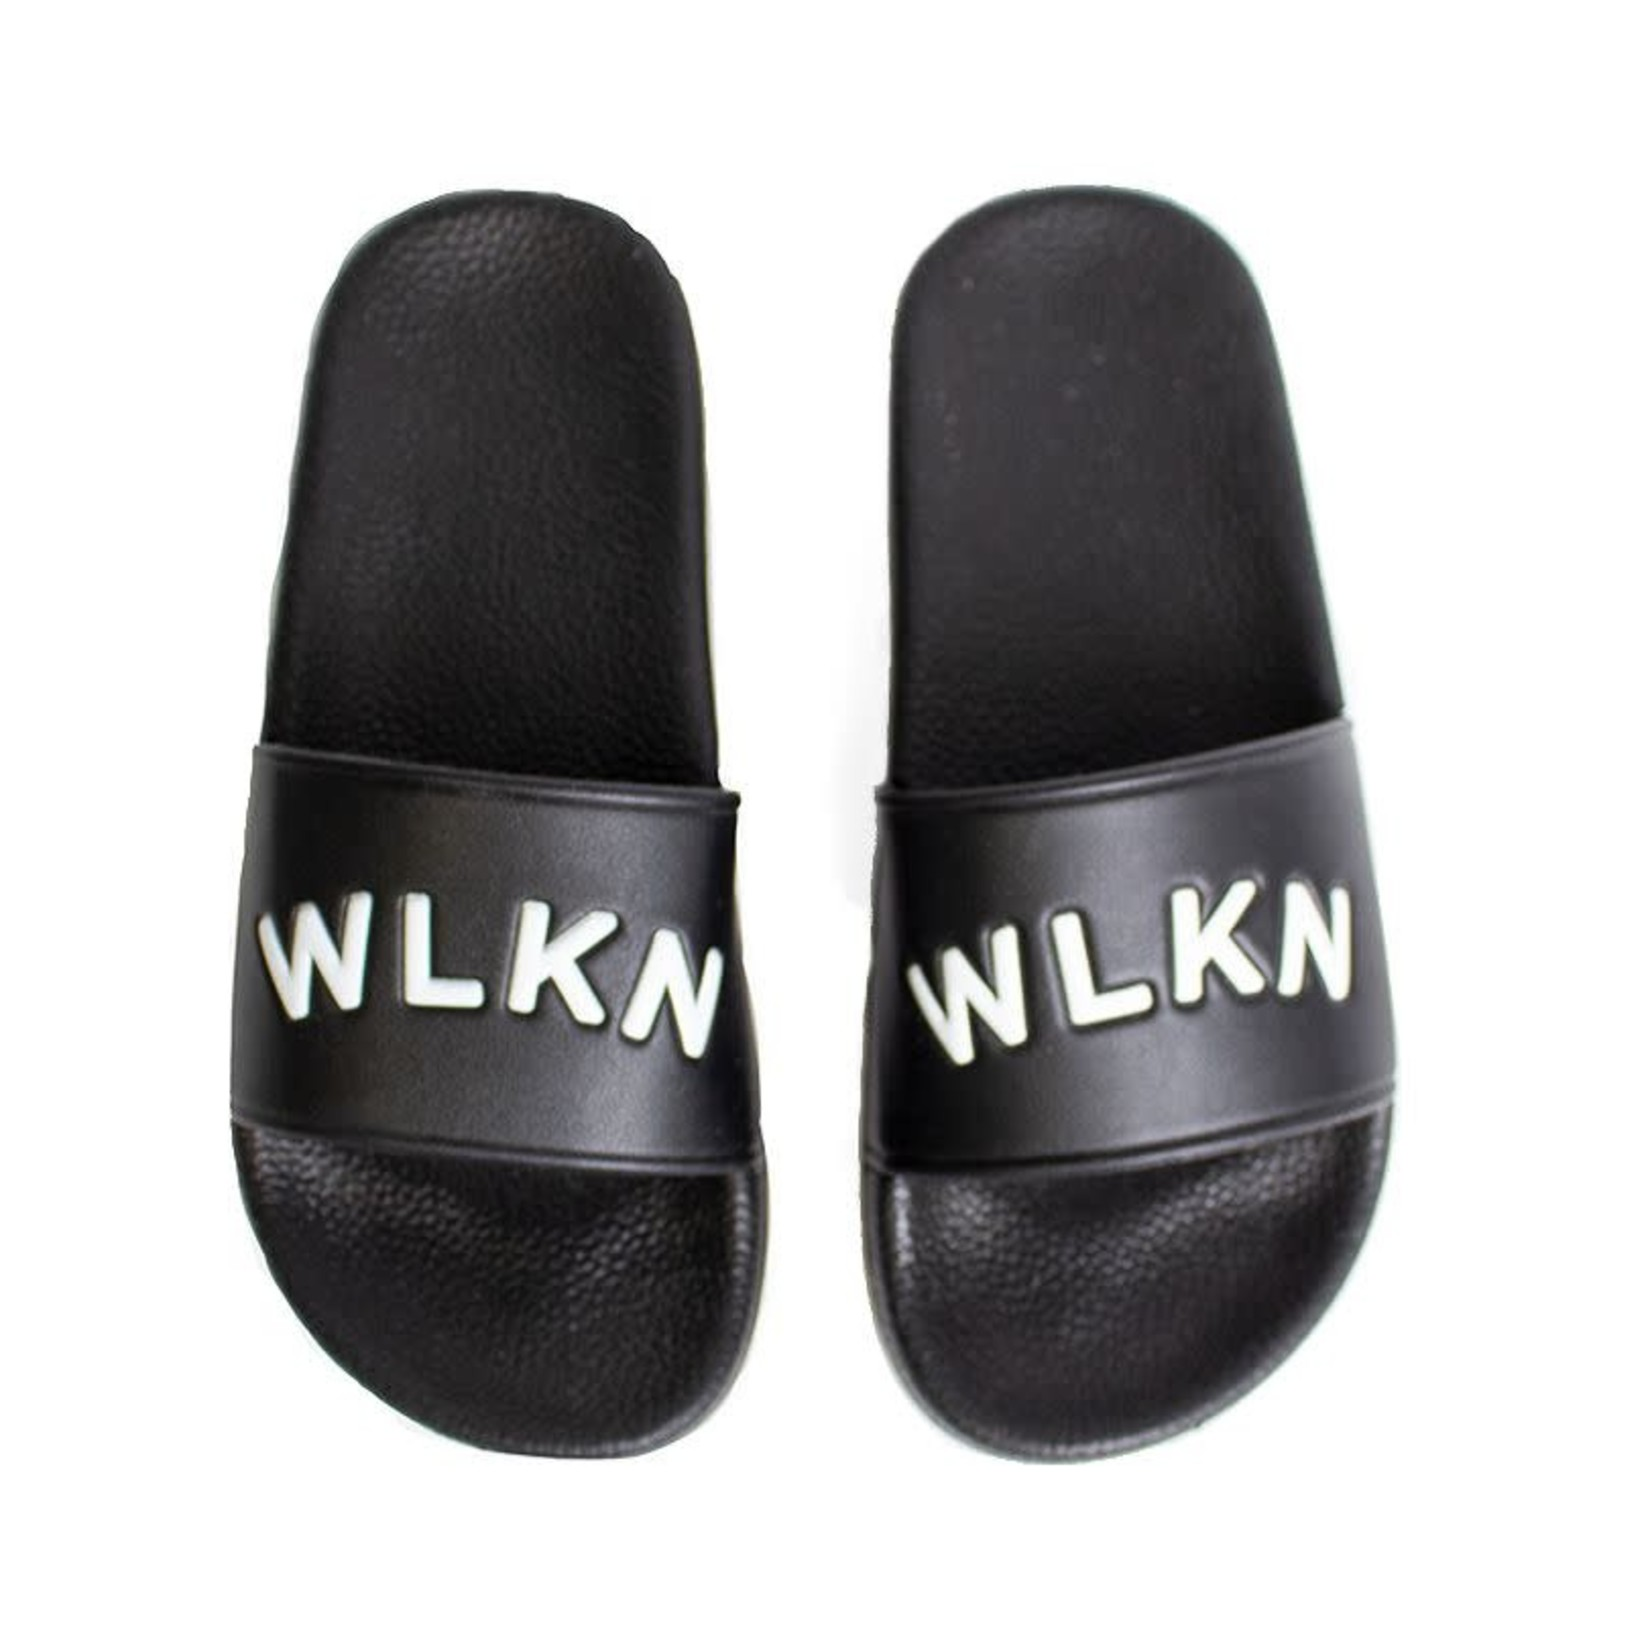 WLKN WLKN : Junior Rounded Logo Slides